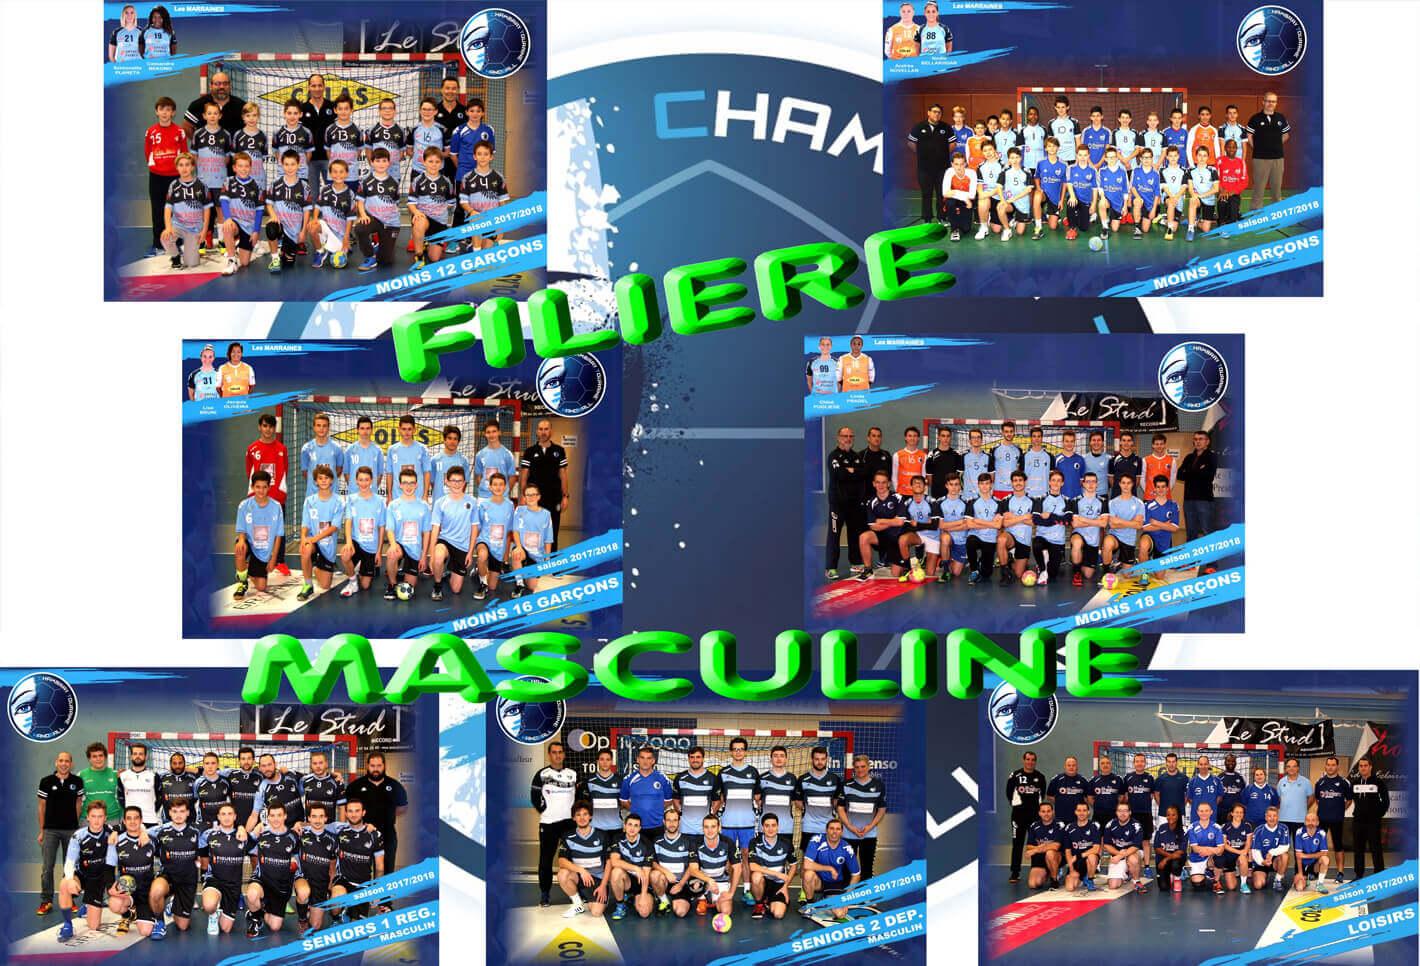 2018-07-16-bilan-filiere-masculine-2017-2018-article@2x